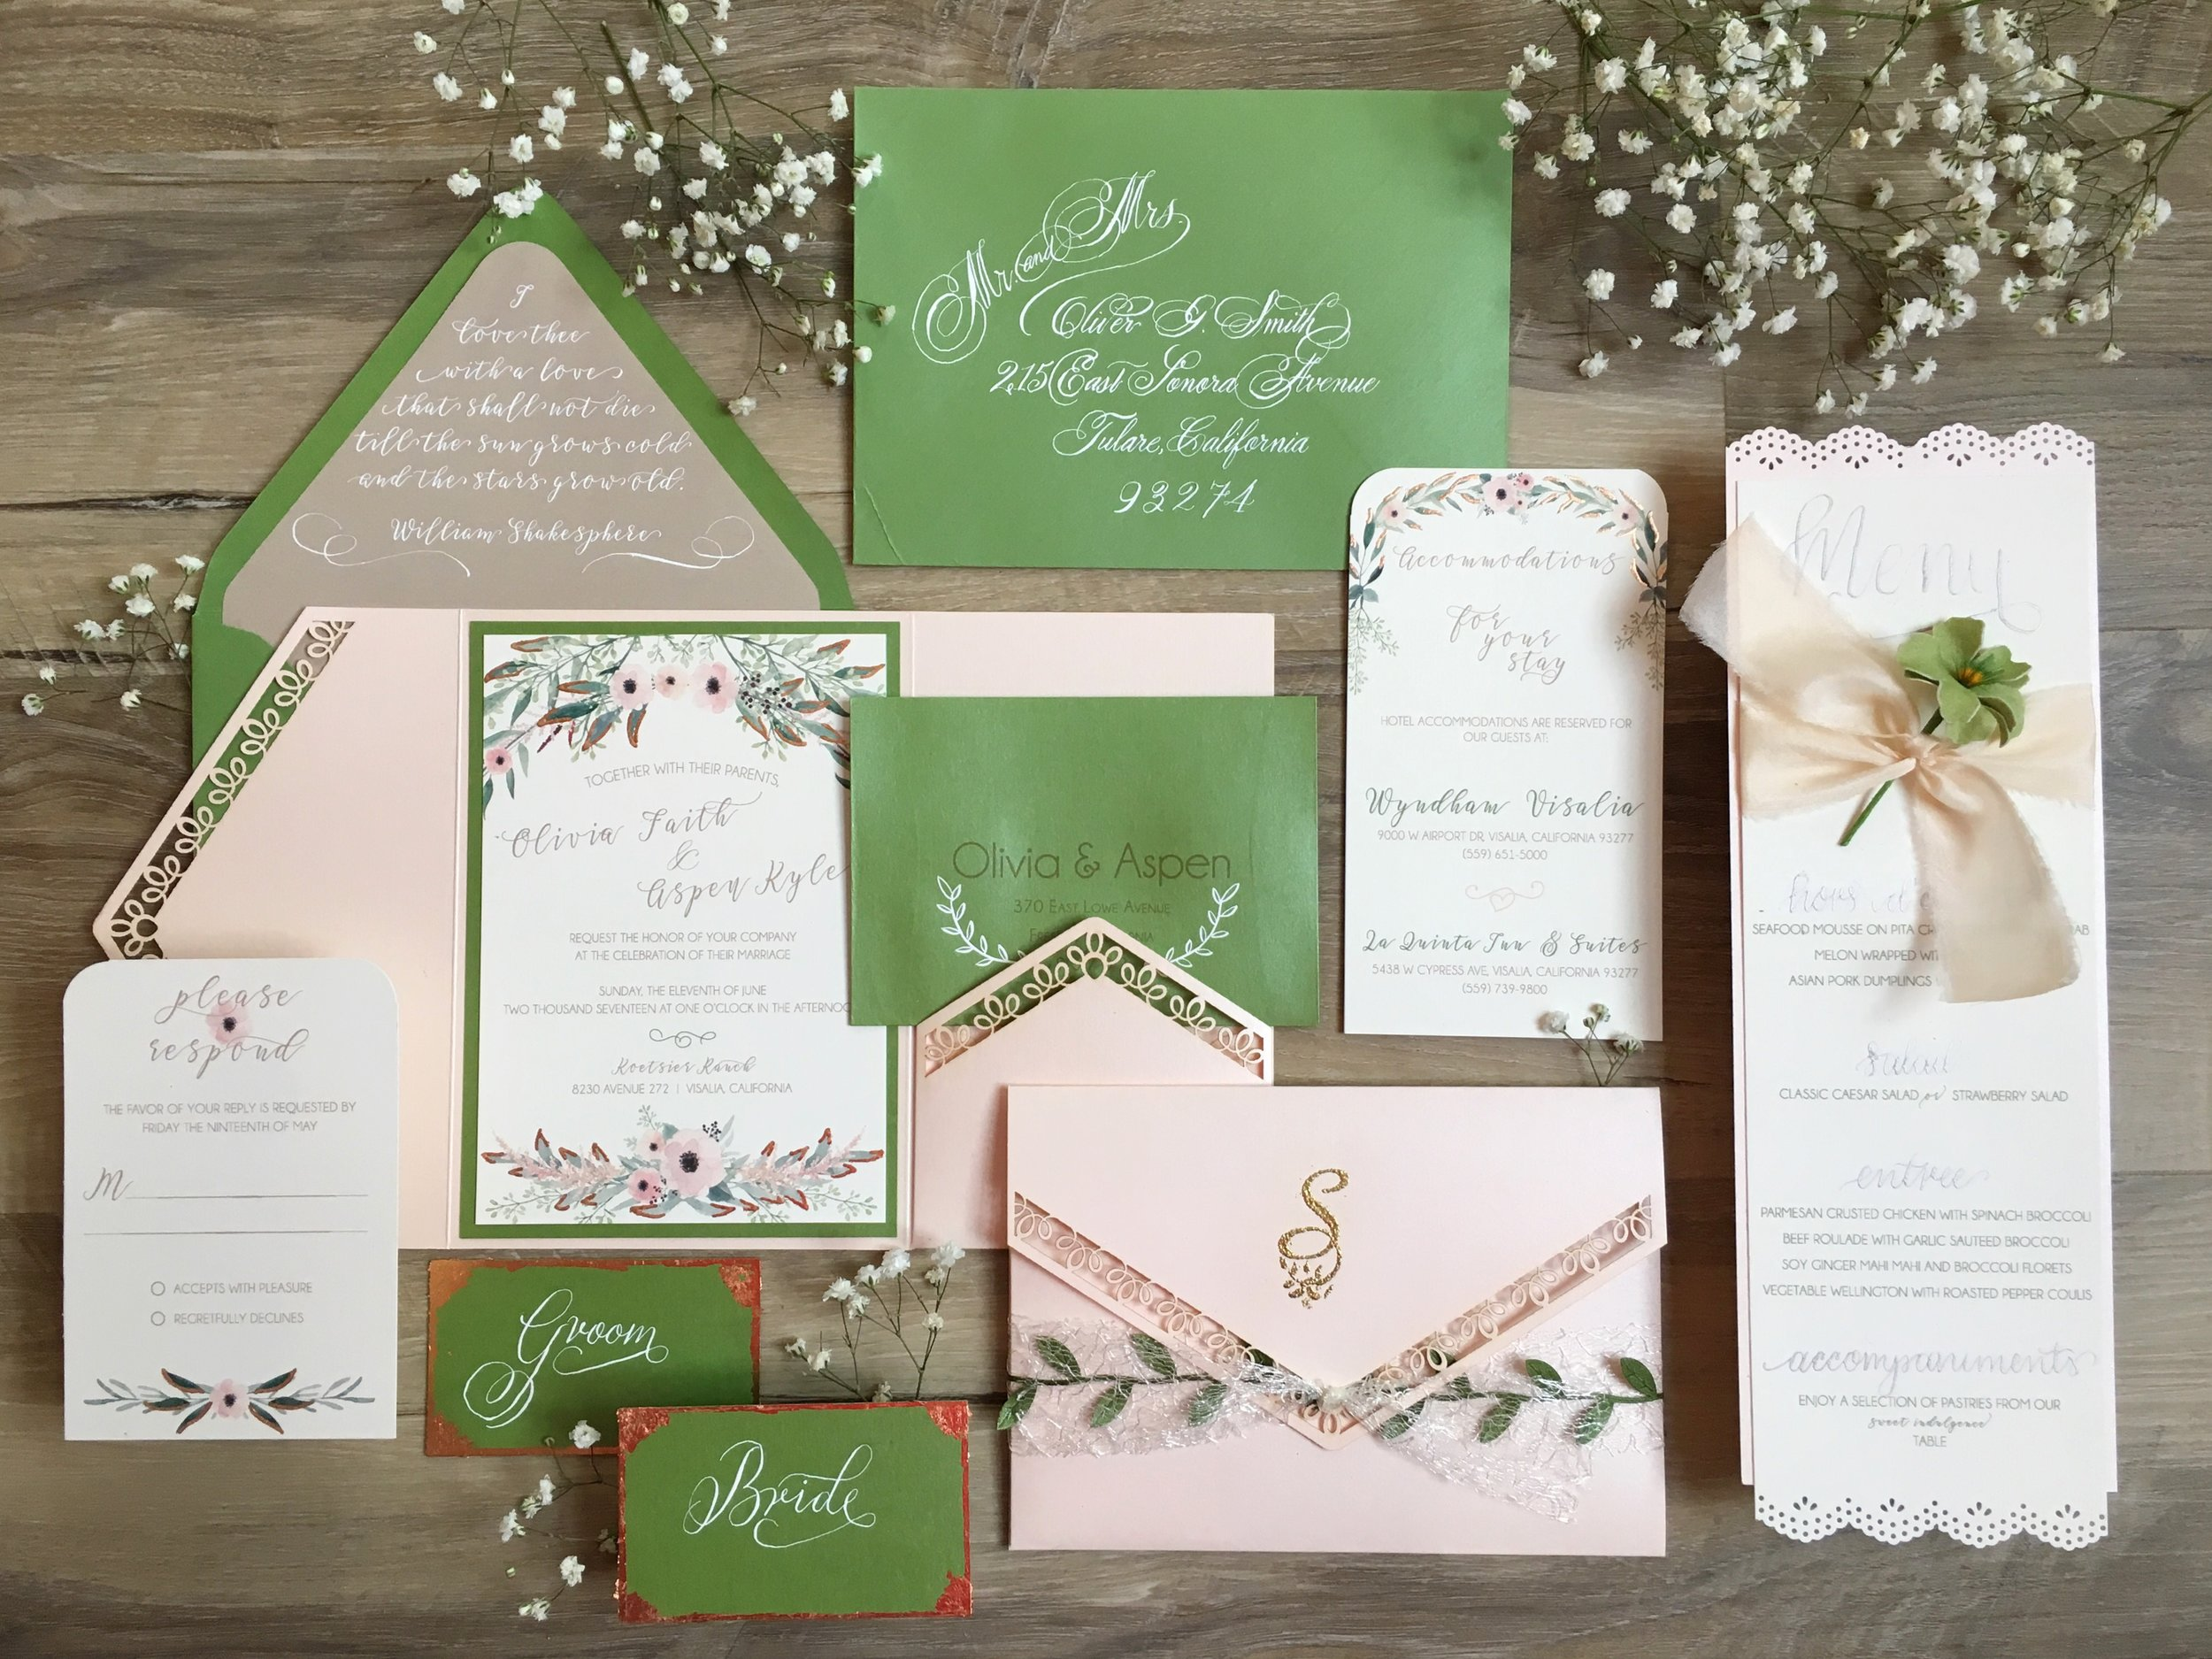 Central PA, York PA, JesSmith Designs, custom, wedding, invitations, bridal, announcements, save the date-02-02 12.10.31.jpg